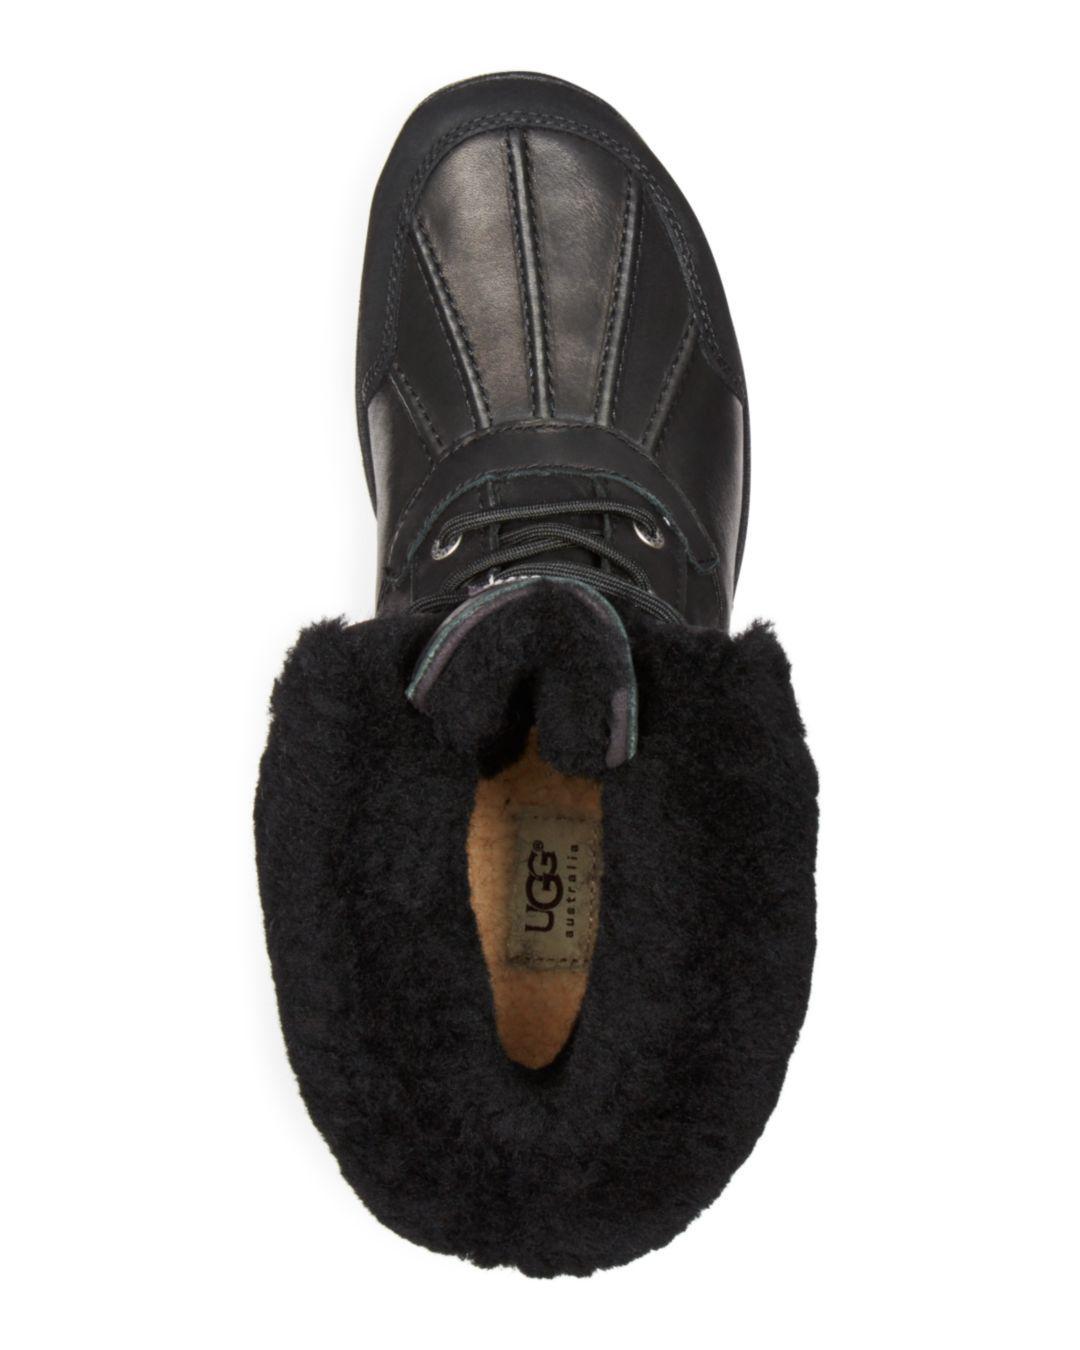 487dde656bb Lyst - UGG Australia Men's Butte Boots in Black for Men